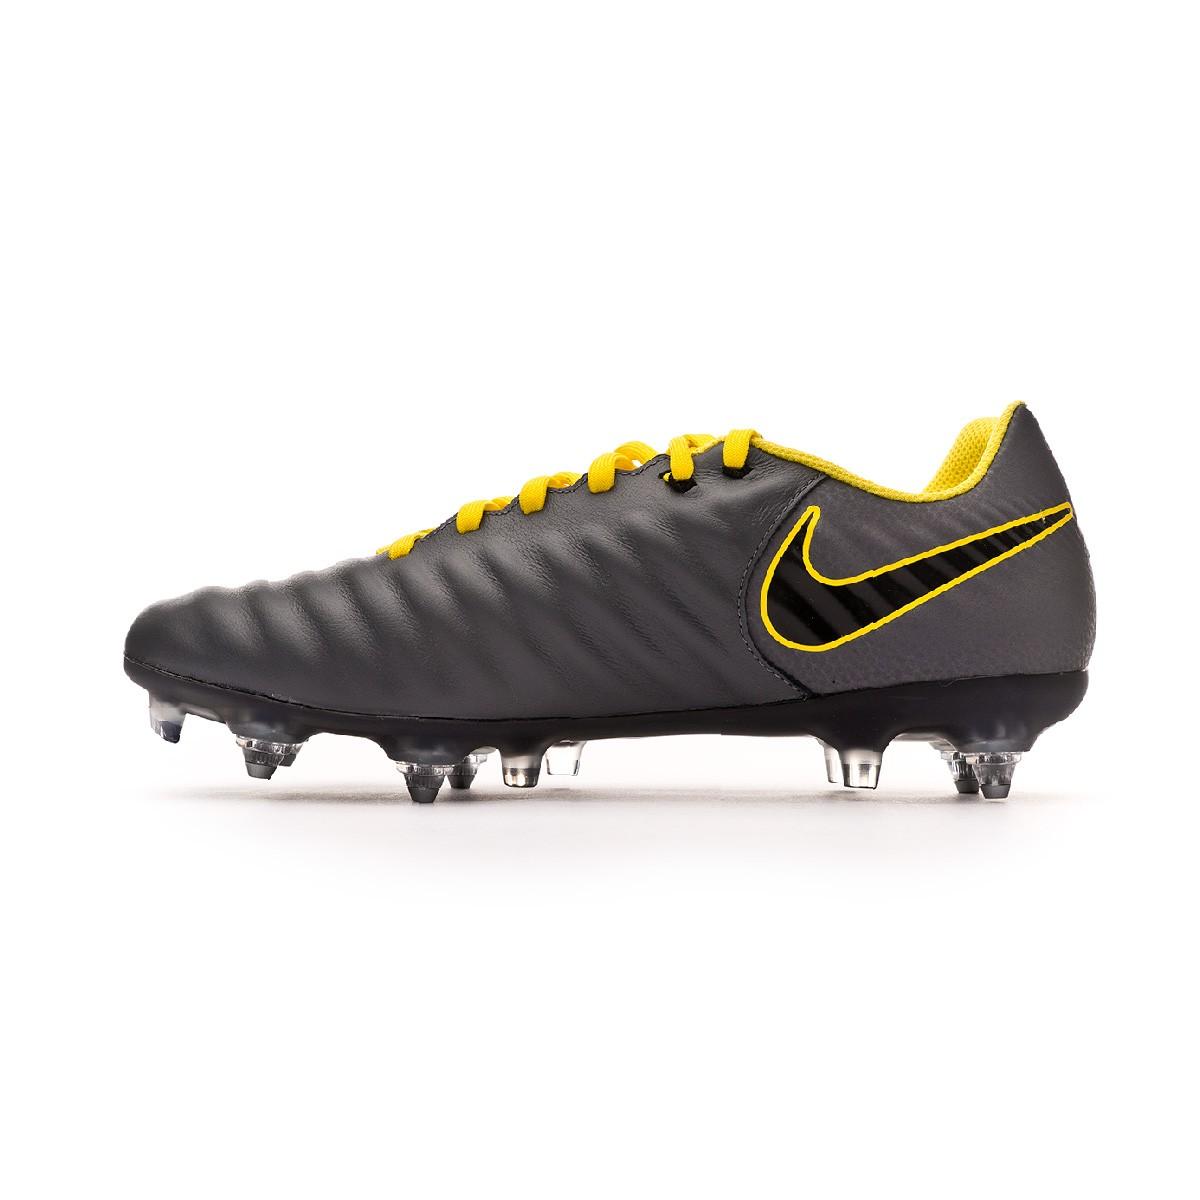 b2d5acebbde Football Boots Nike Tiempo Legend VII Academy SG-Pro ACC Dark grey-Black-Optical  yellow - Football store Fútbol Emotion